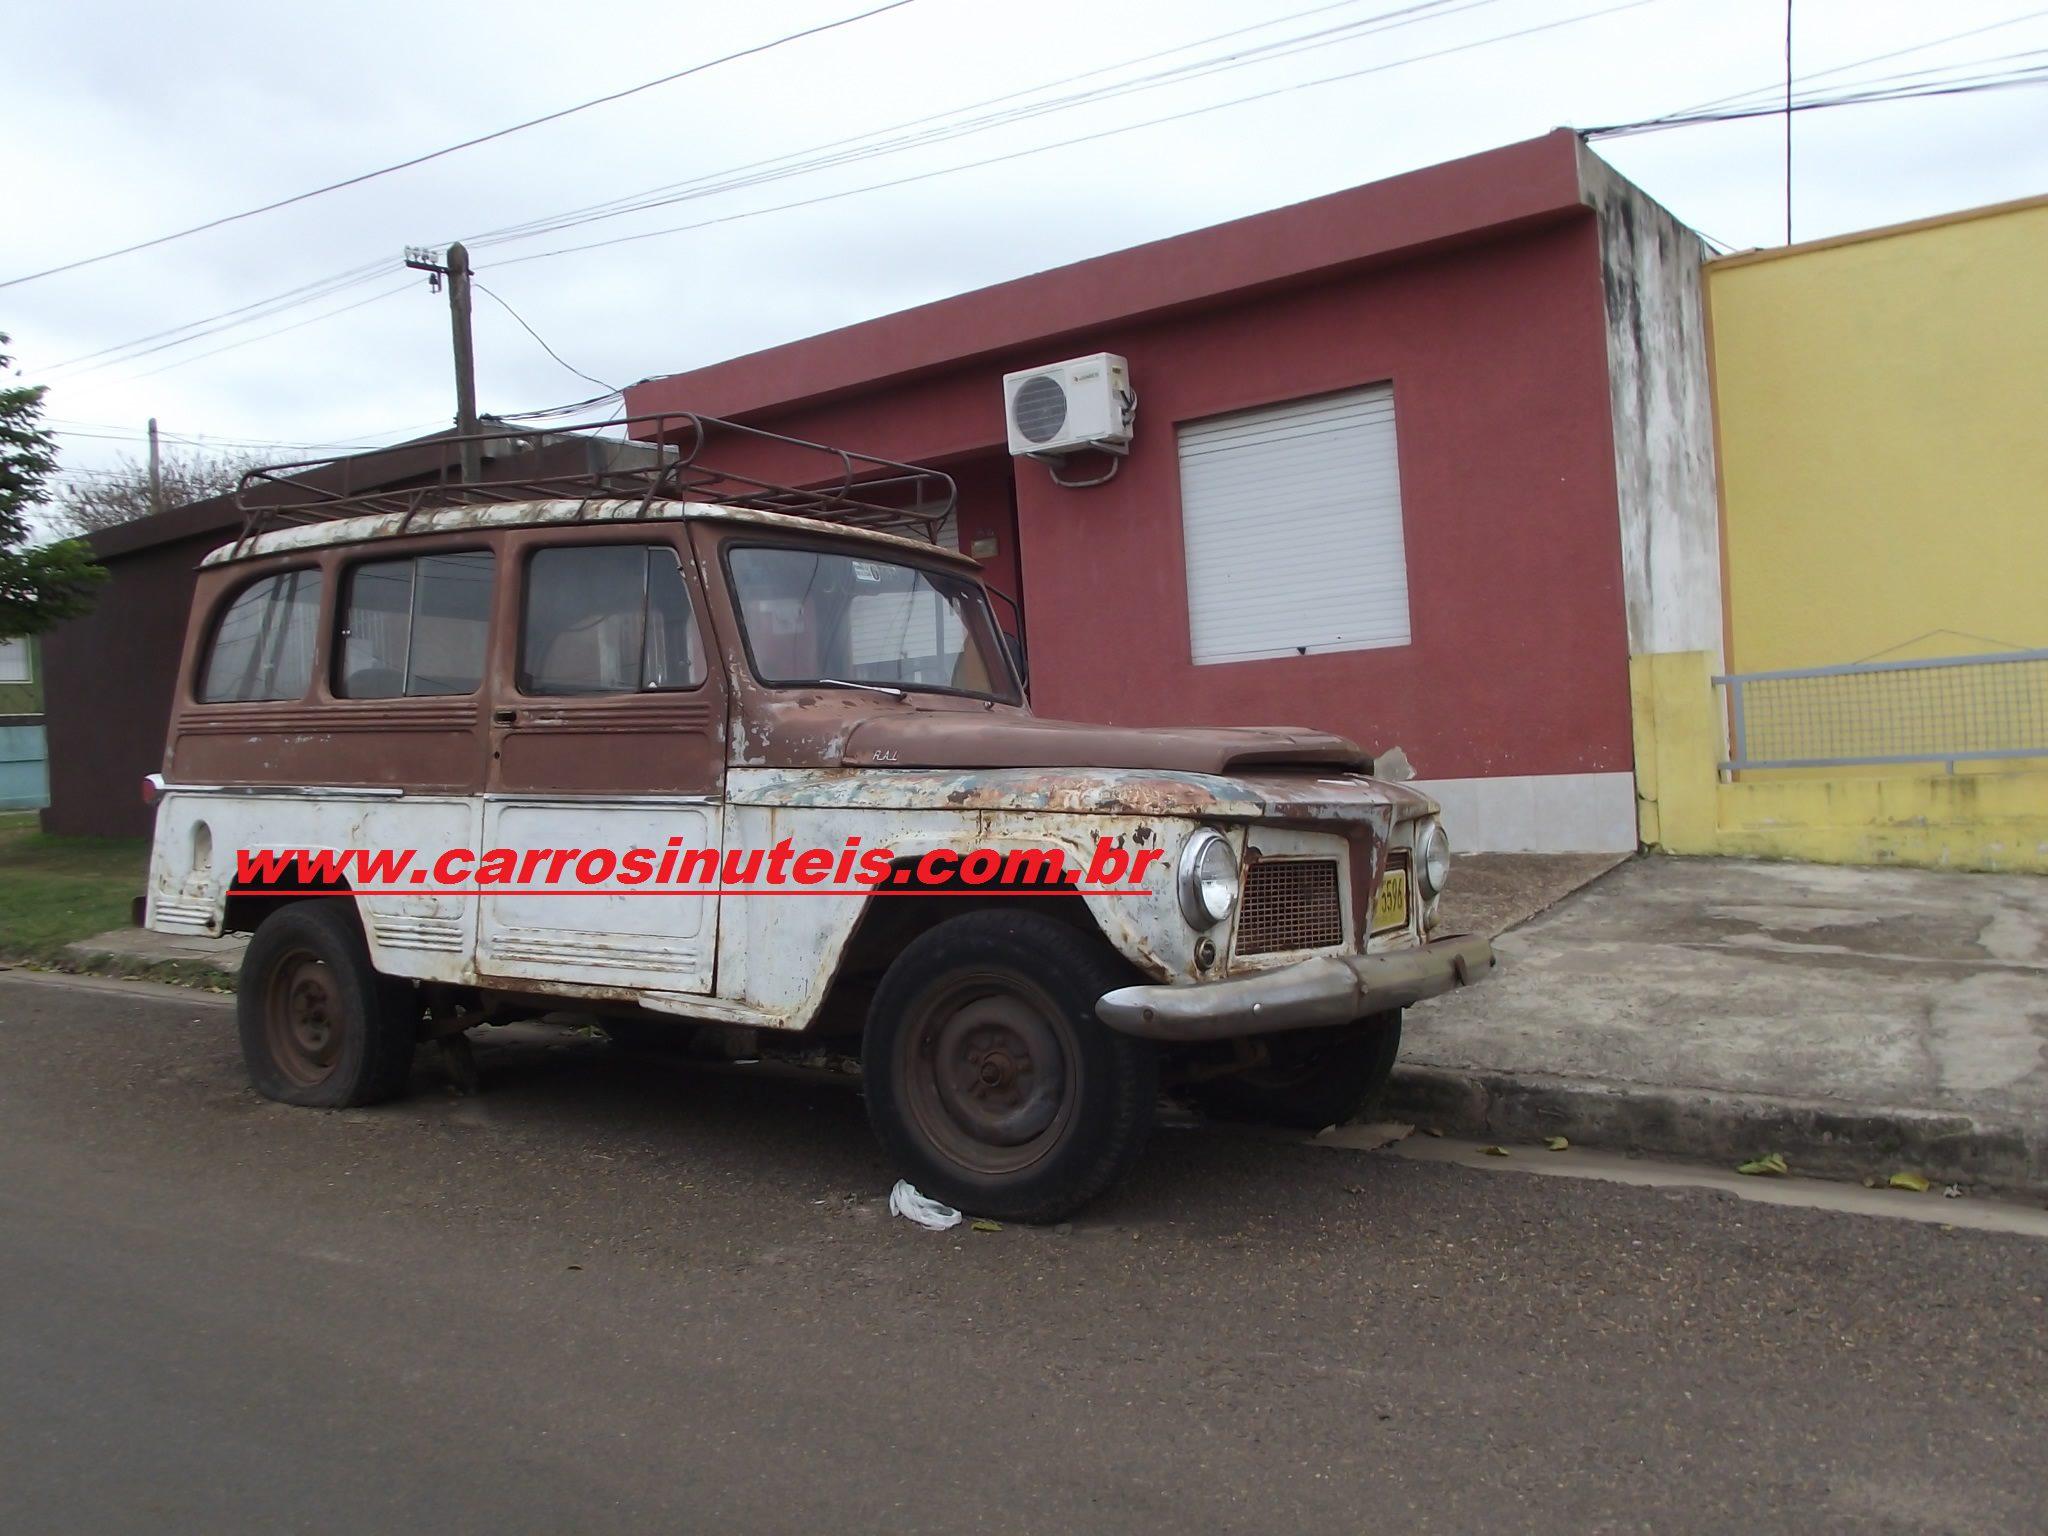 MarceloKTRuralUruguay-9 Rural Willys, Marcelo KT, Artigas, Uruguai